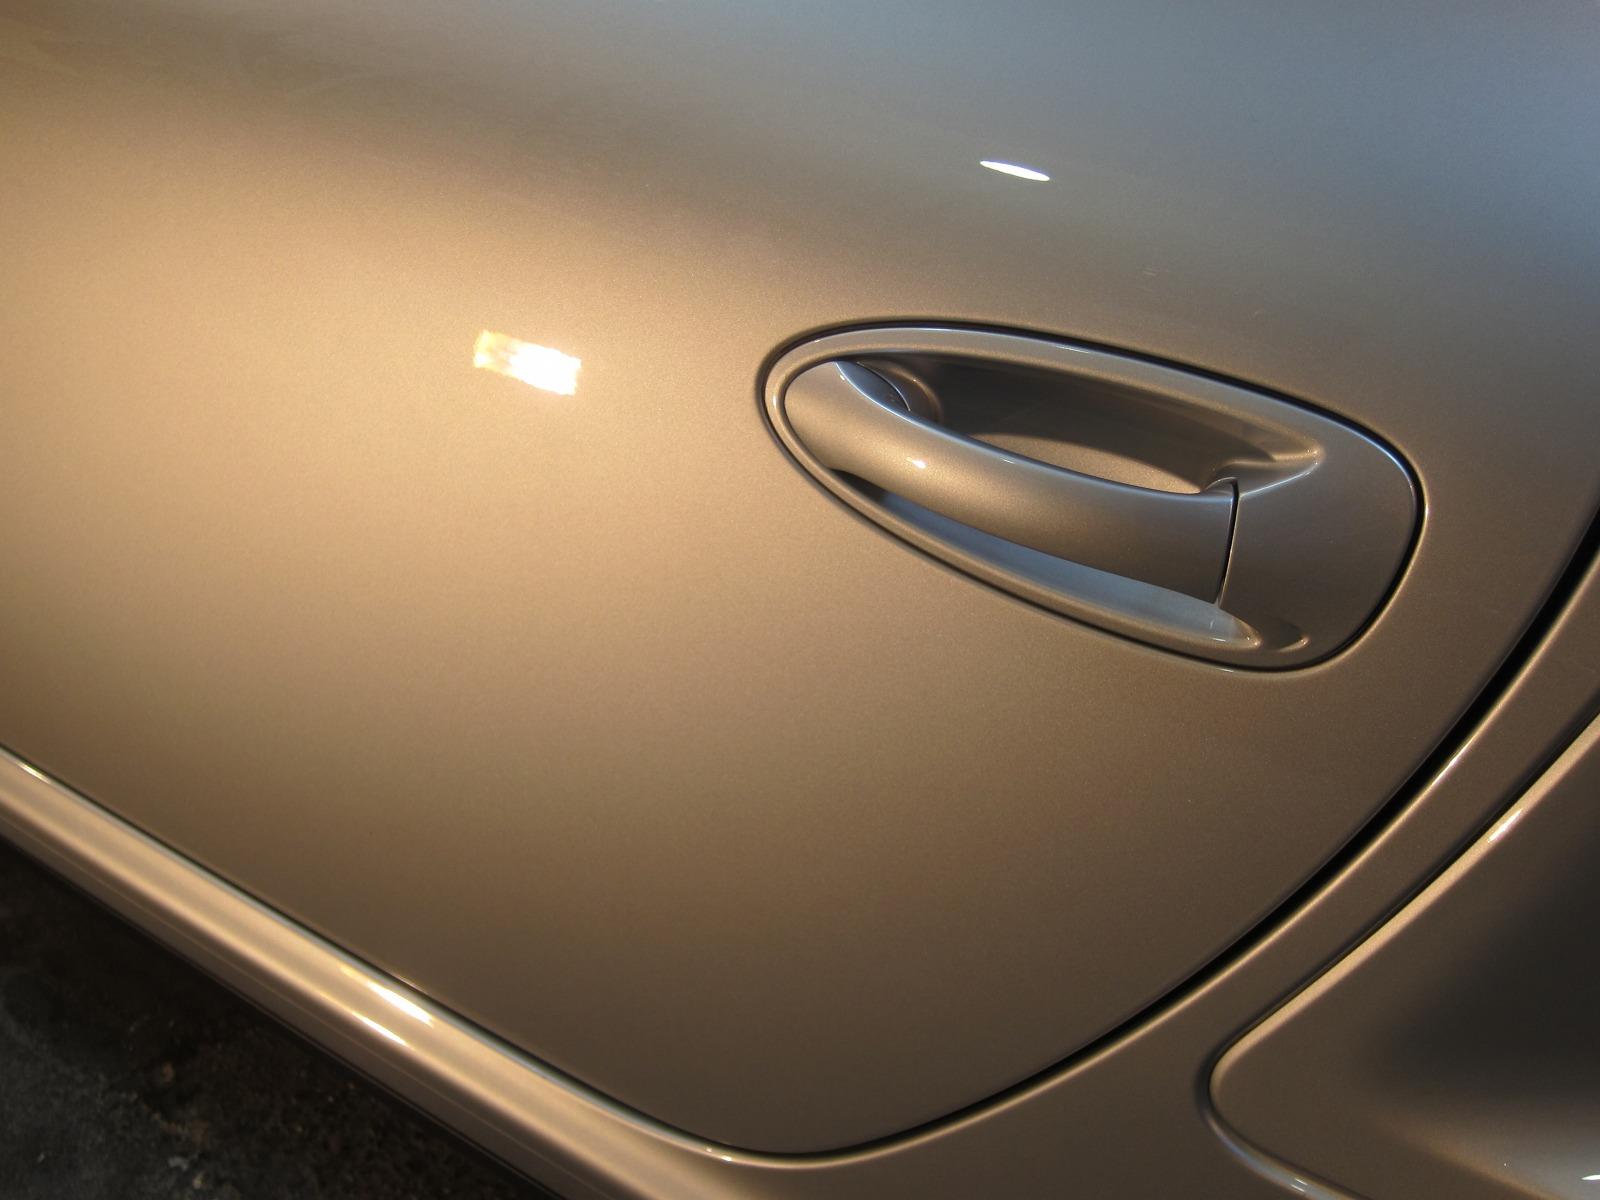 20140819-porsche-911-turbo-06